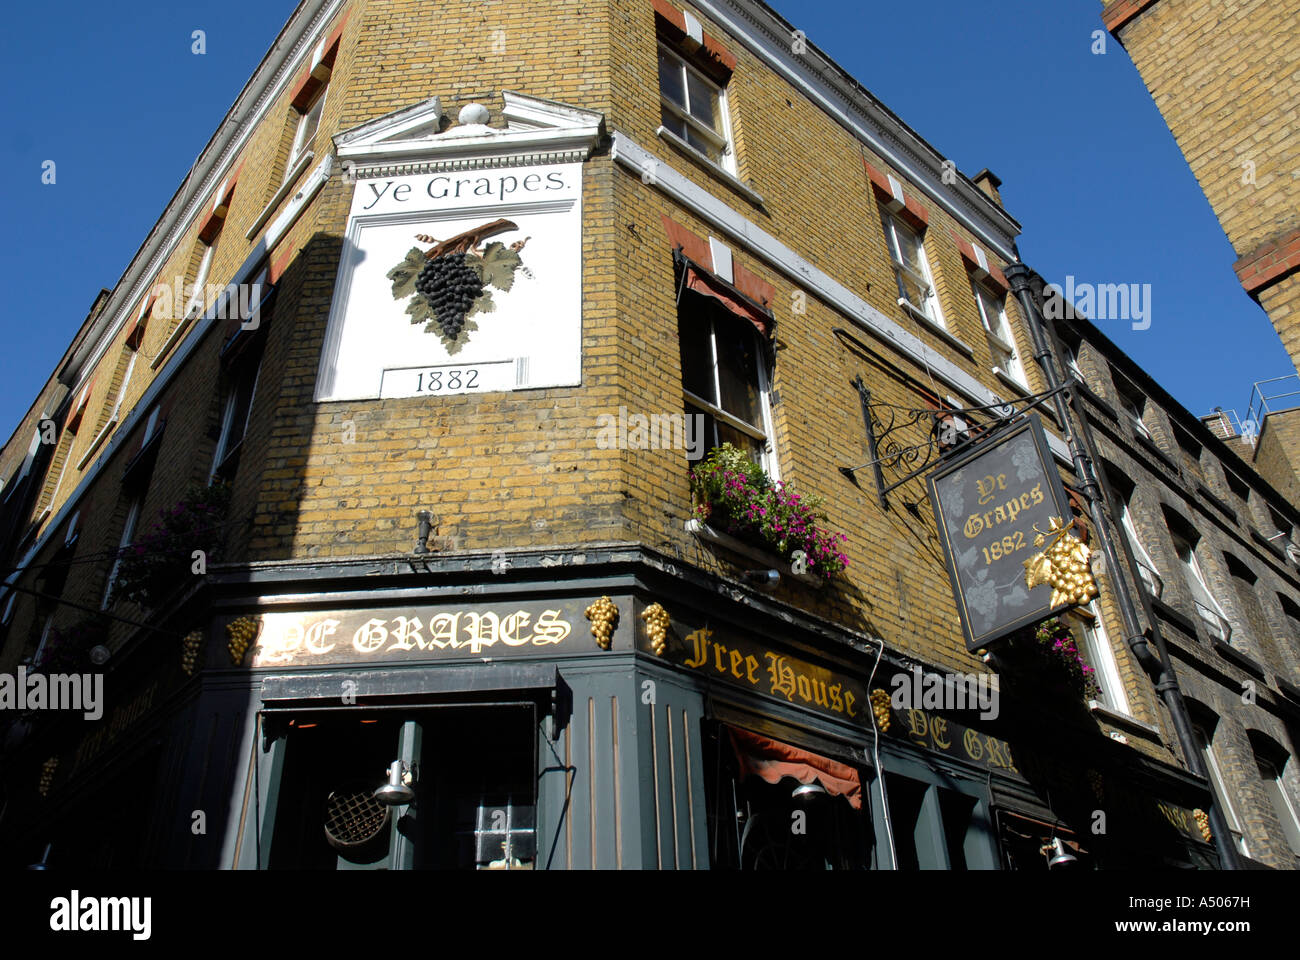 The Grapes pub in Shepherds Market London - Stock Image